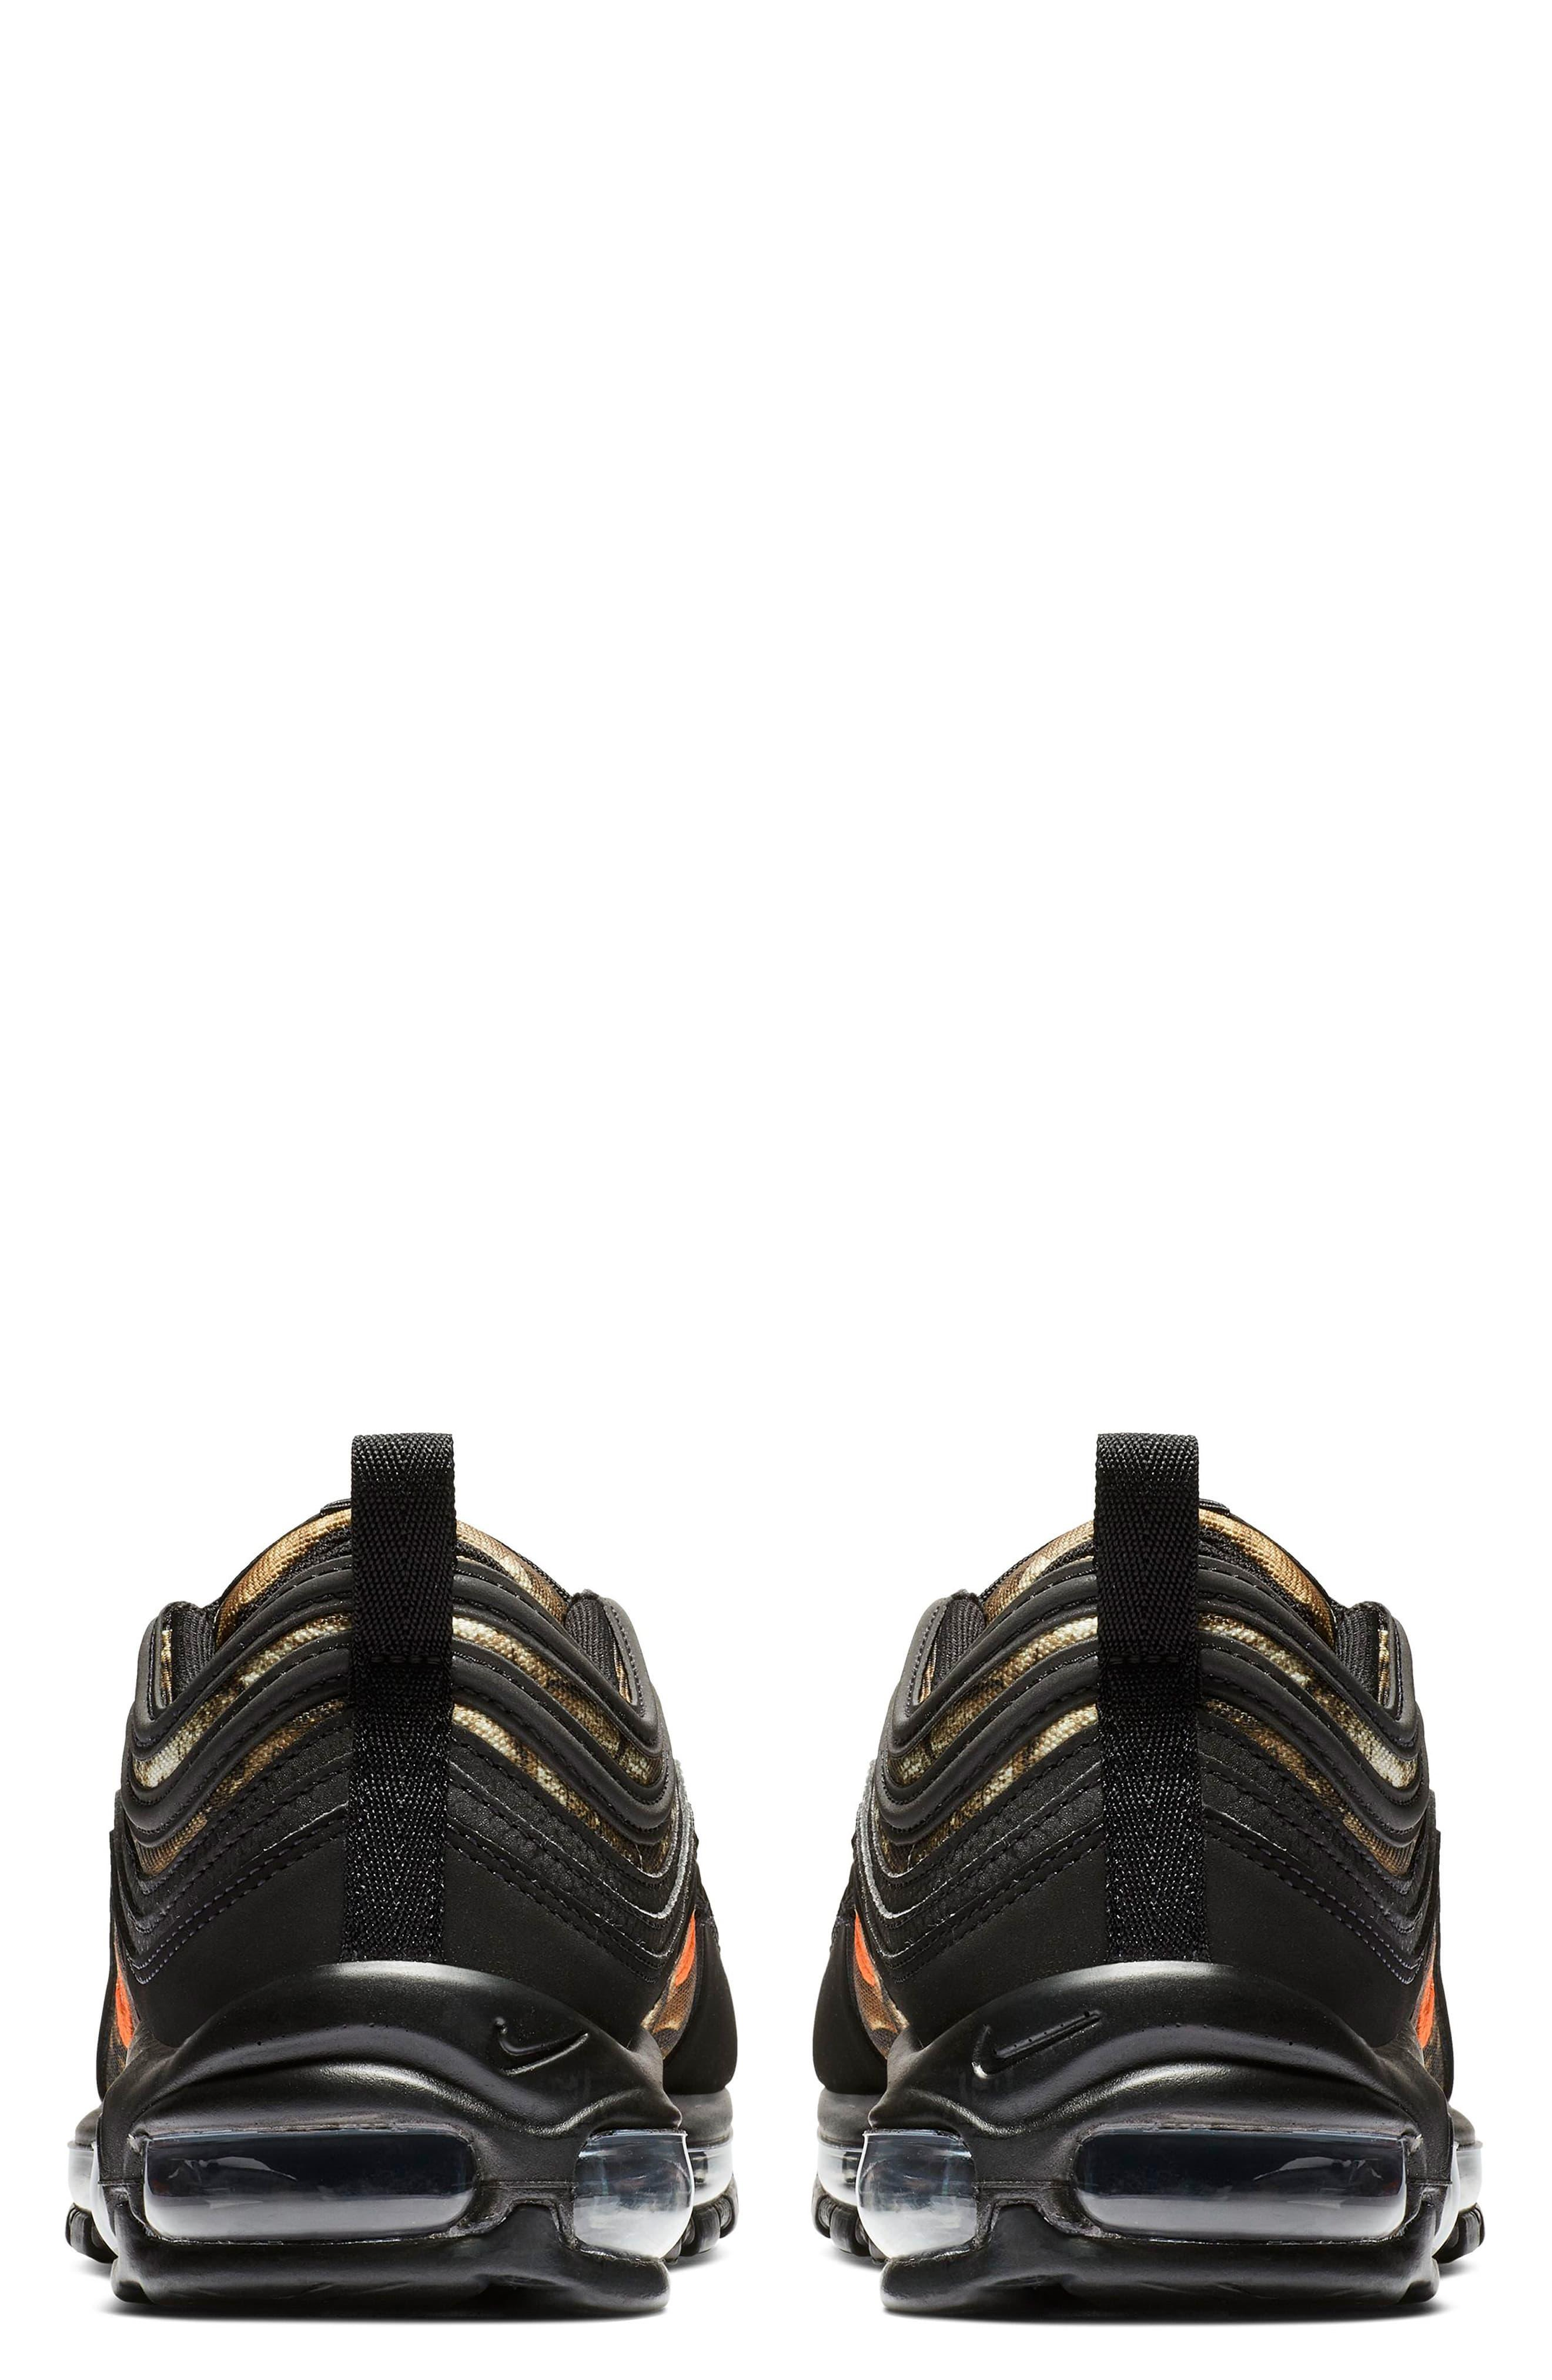 9a2692737b7c5 Nike Air Max 97 Rlt Sneaker in Black for Men - Lyst